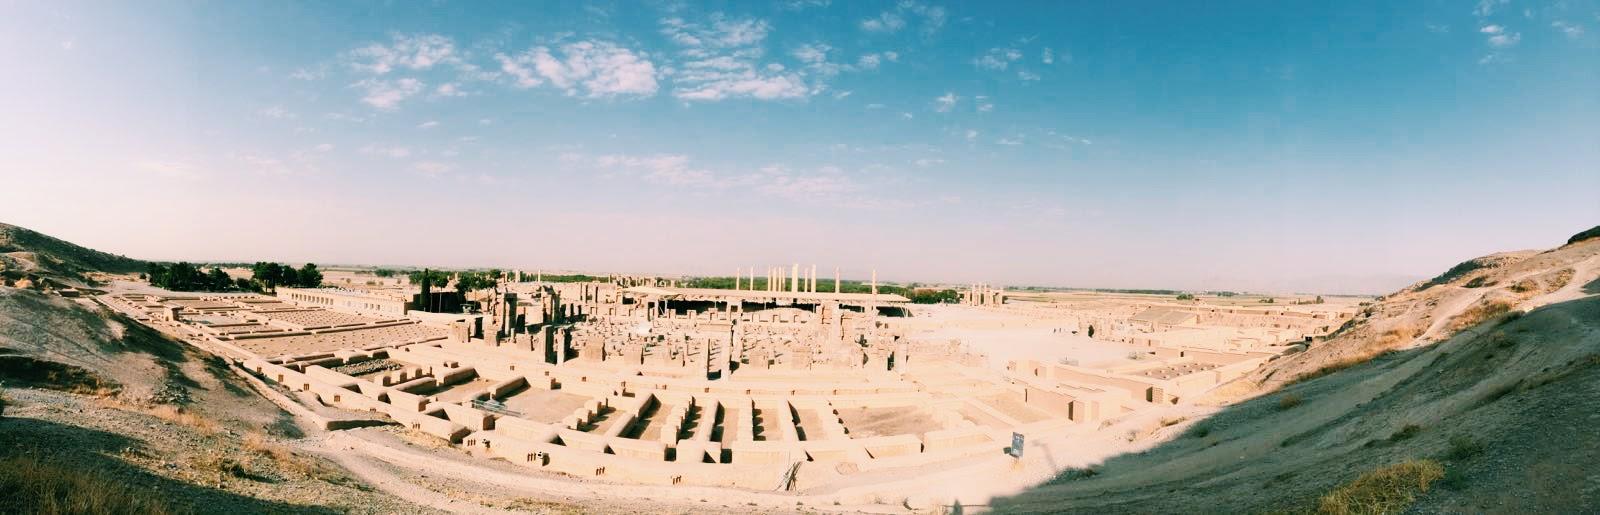 Mags-Frisch-Reisen-Iran-Persepolis